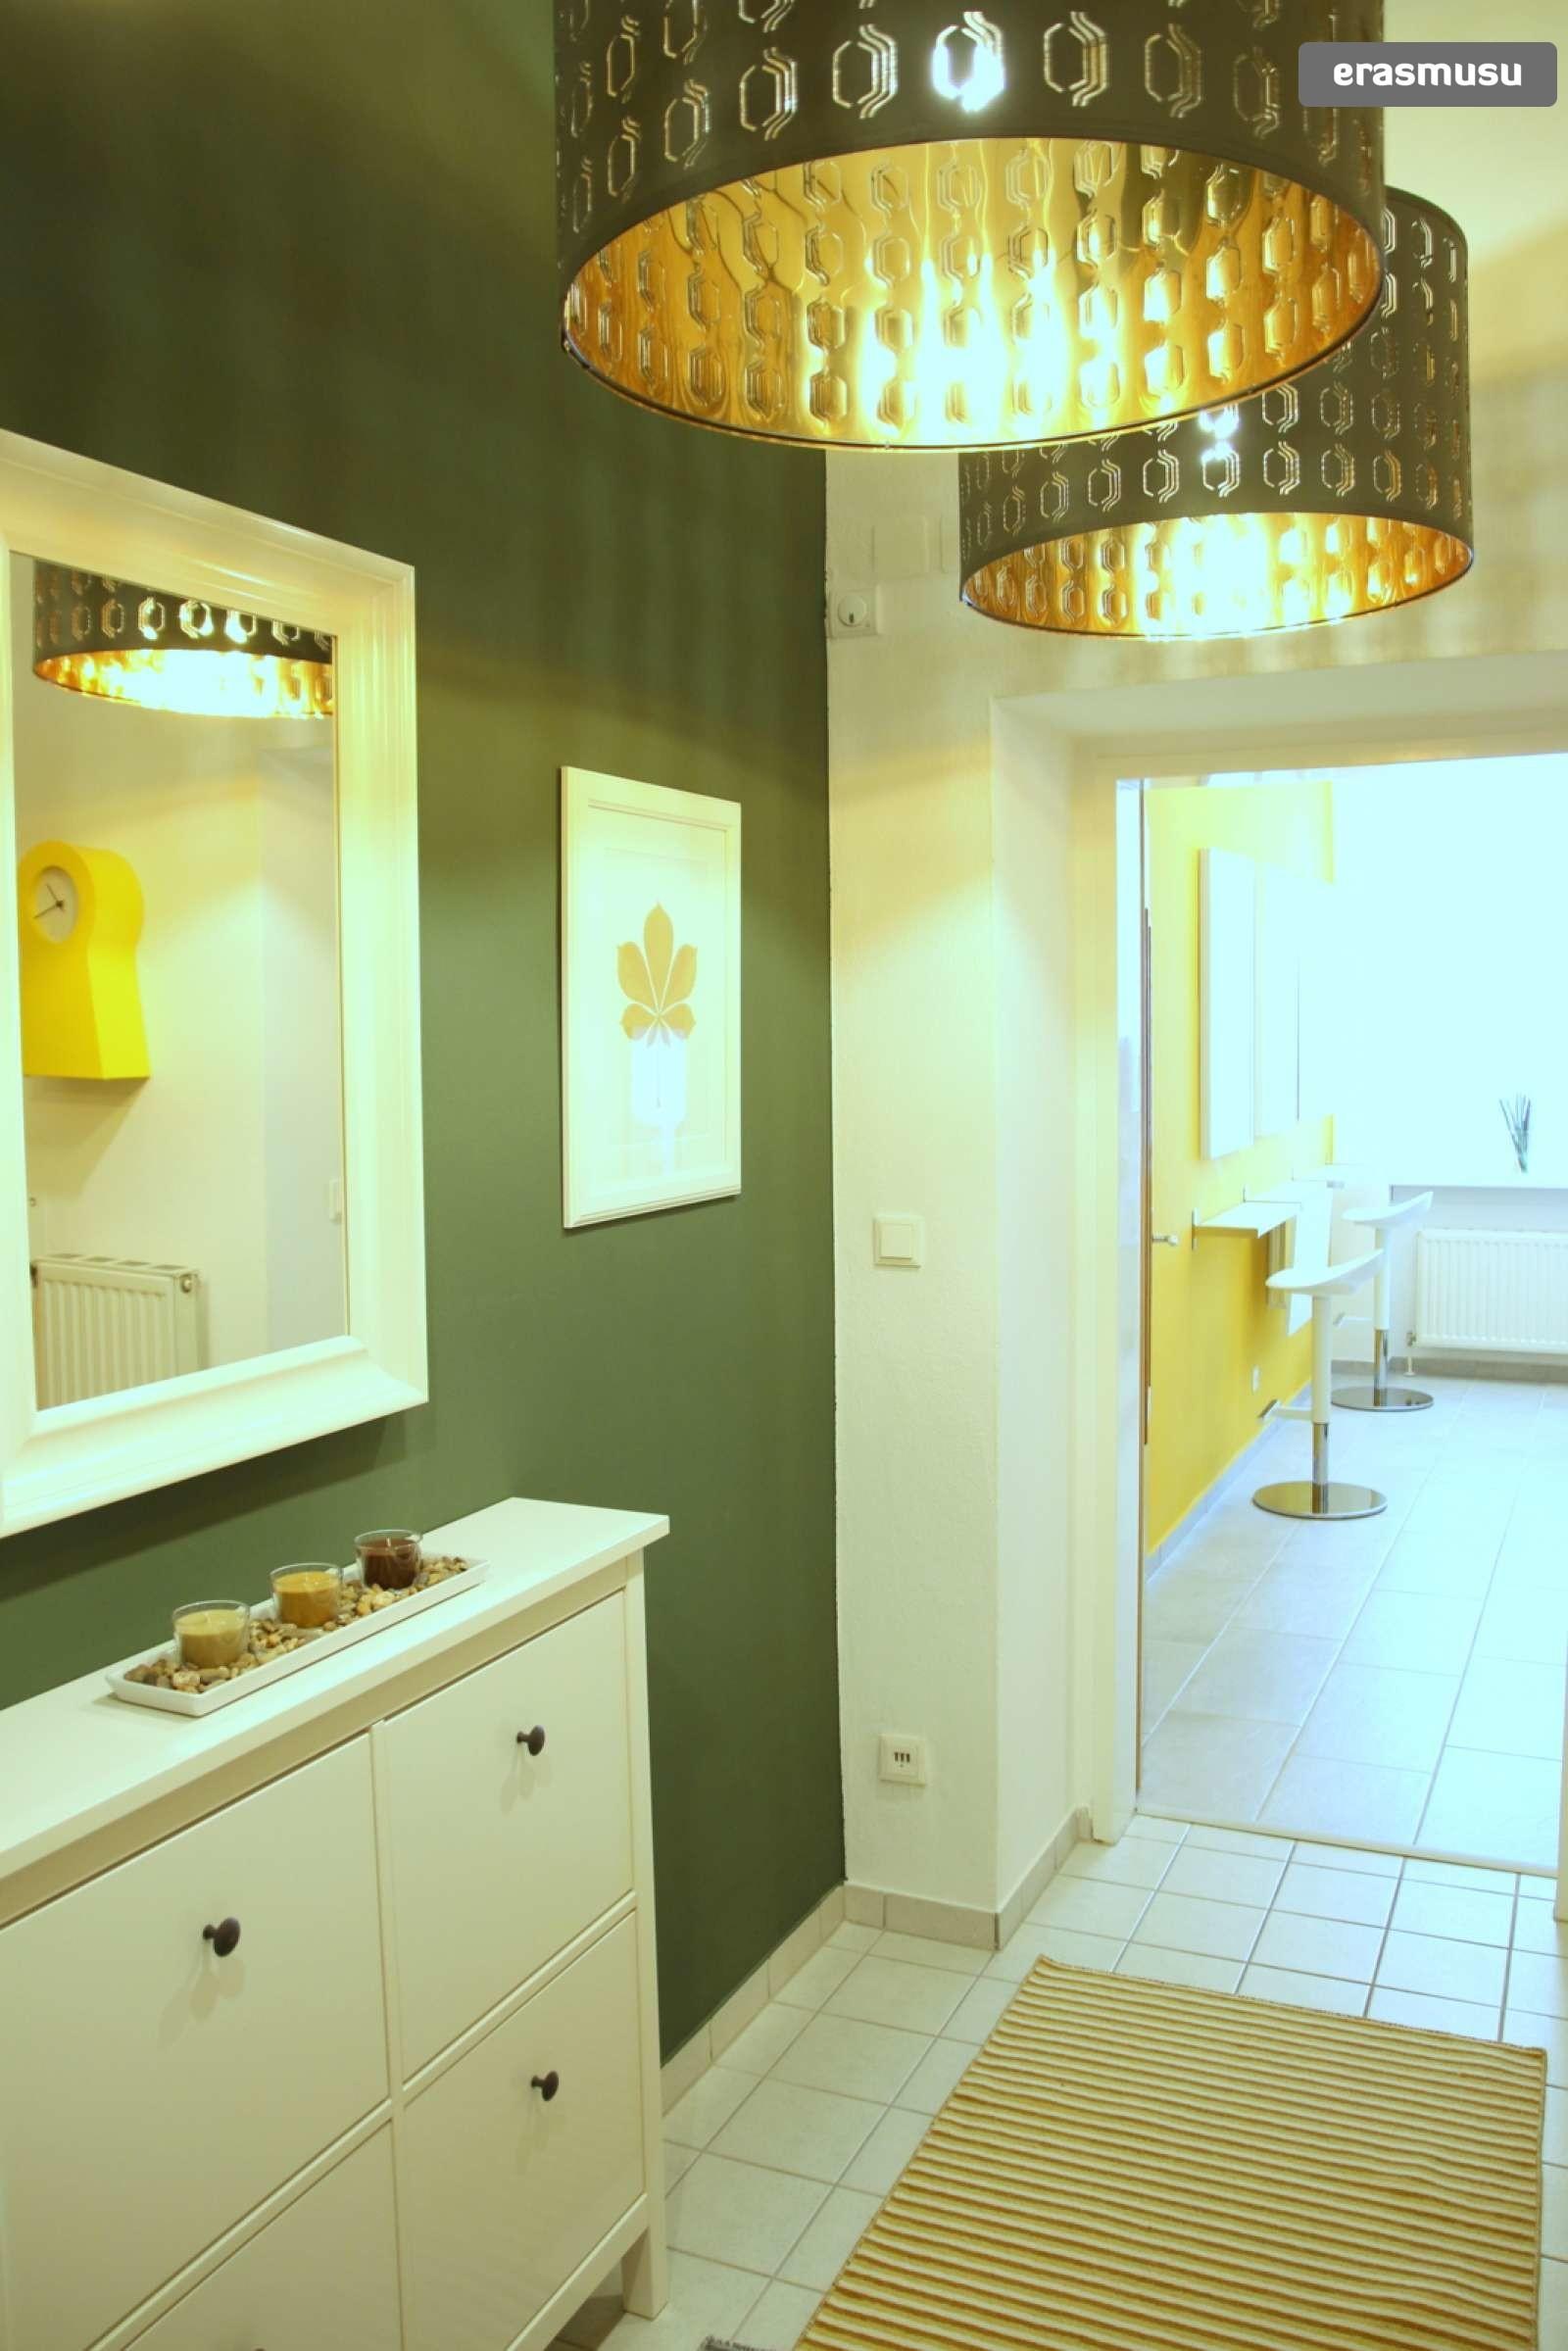 charming-studio-apartment-rent-wahring-c07813fb8e97a17704b9aa56d